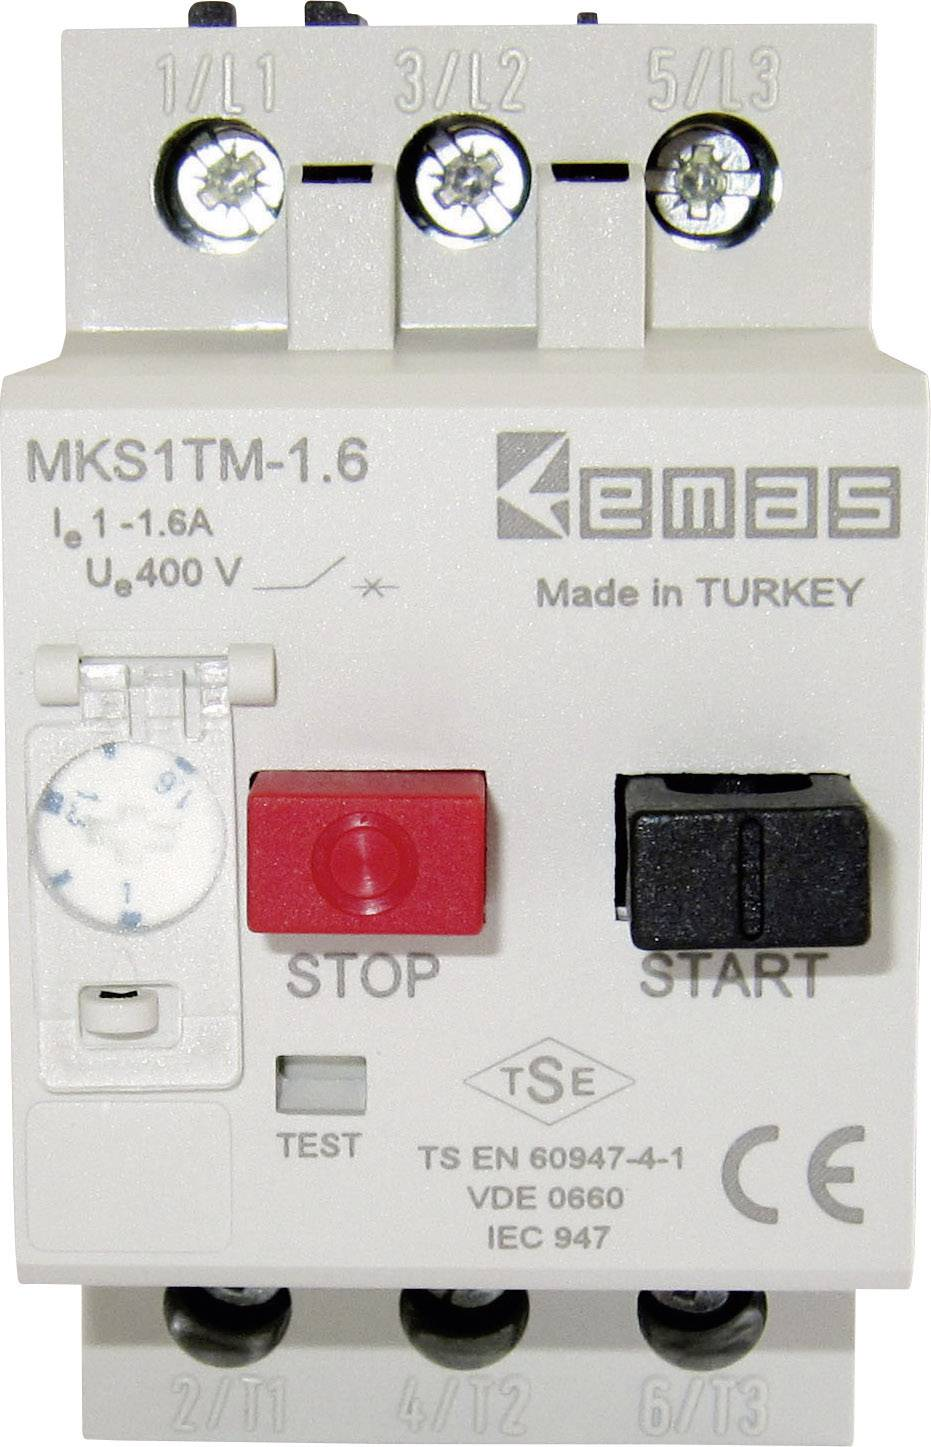 Ochranný spínač motora EMAS MKS1TM-1.6 MKS1TM-1.6, 400 V/AC, 1.6 A, 1 ks